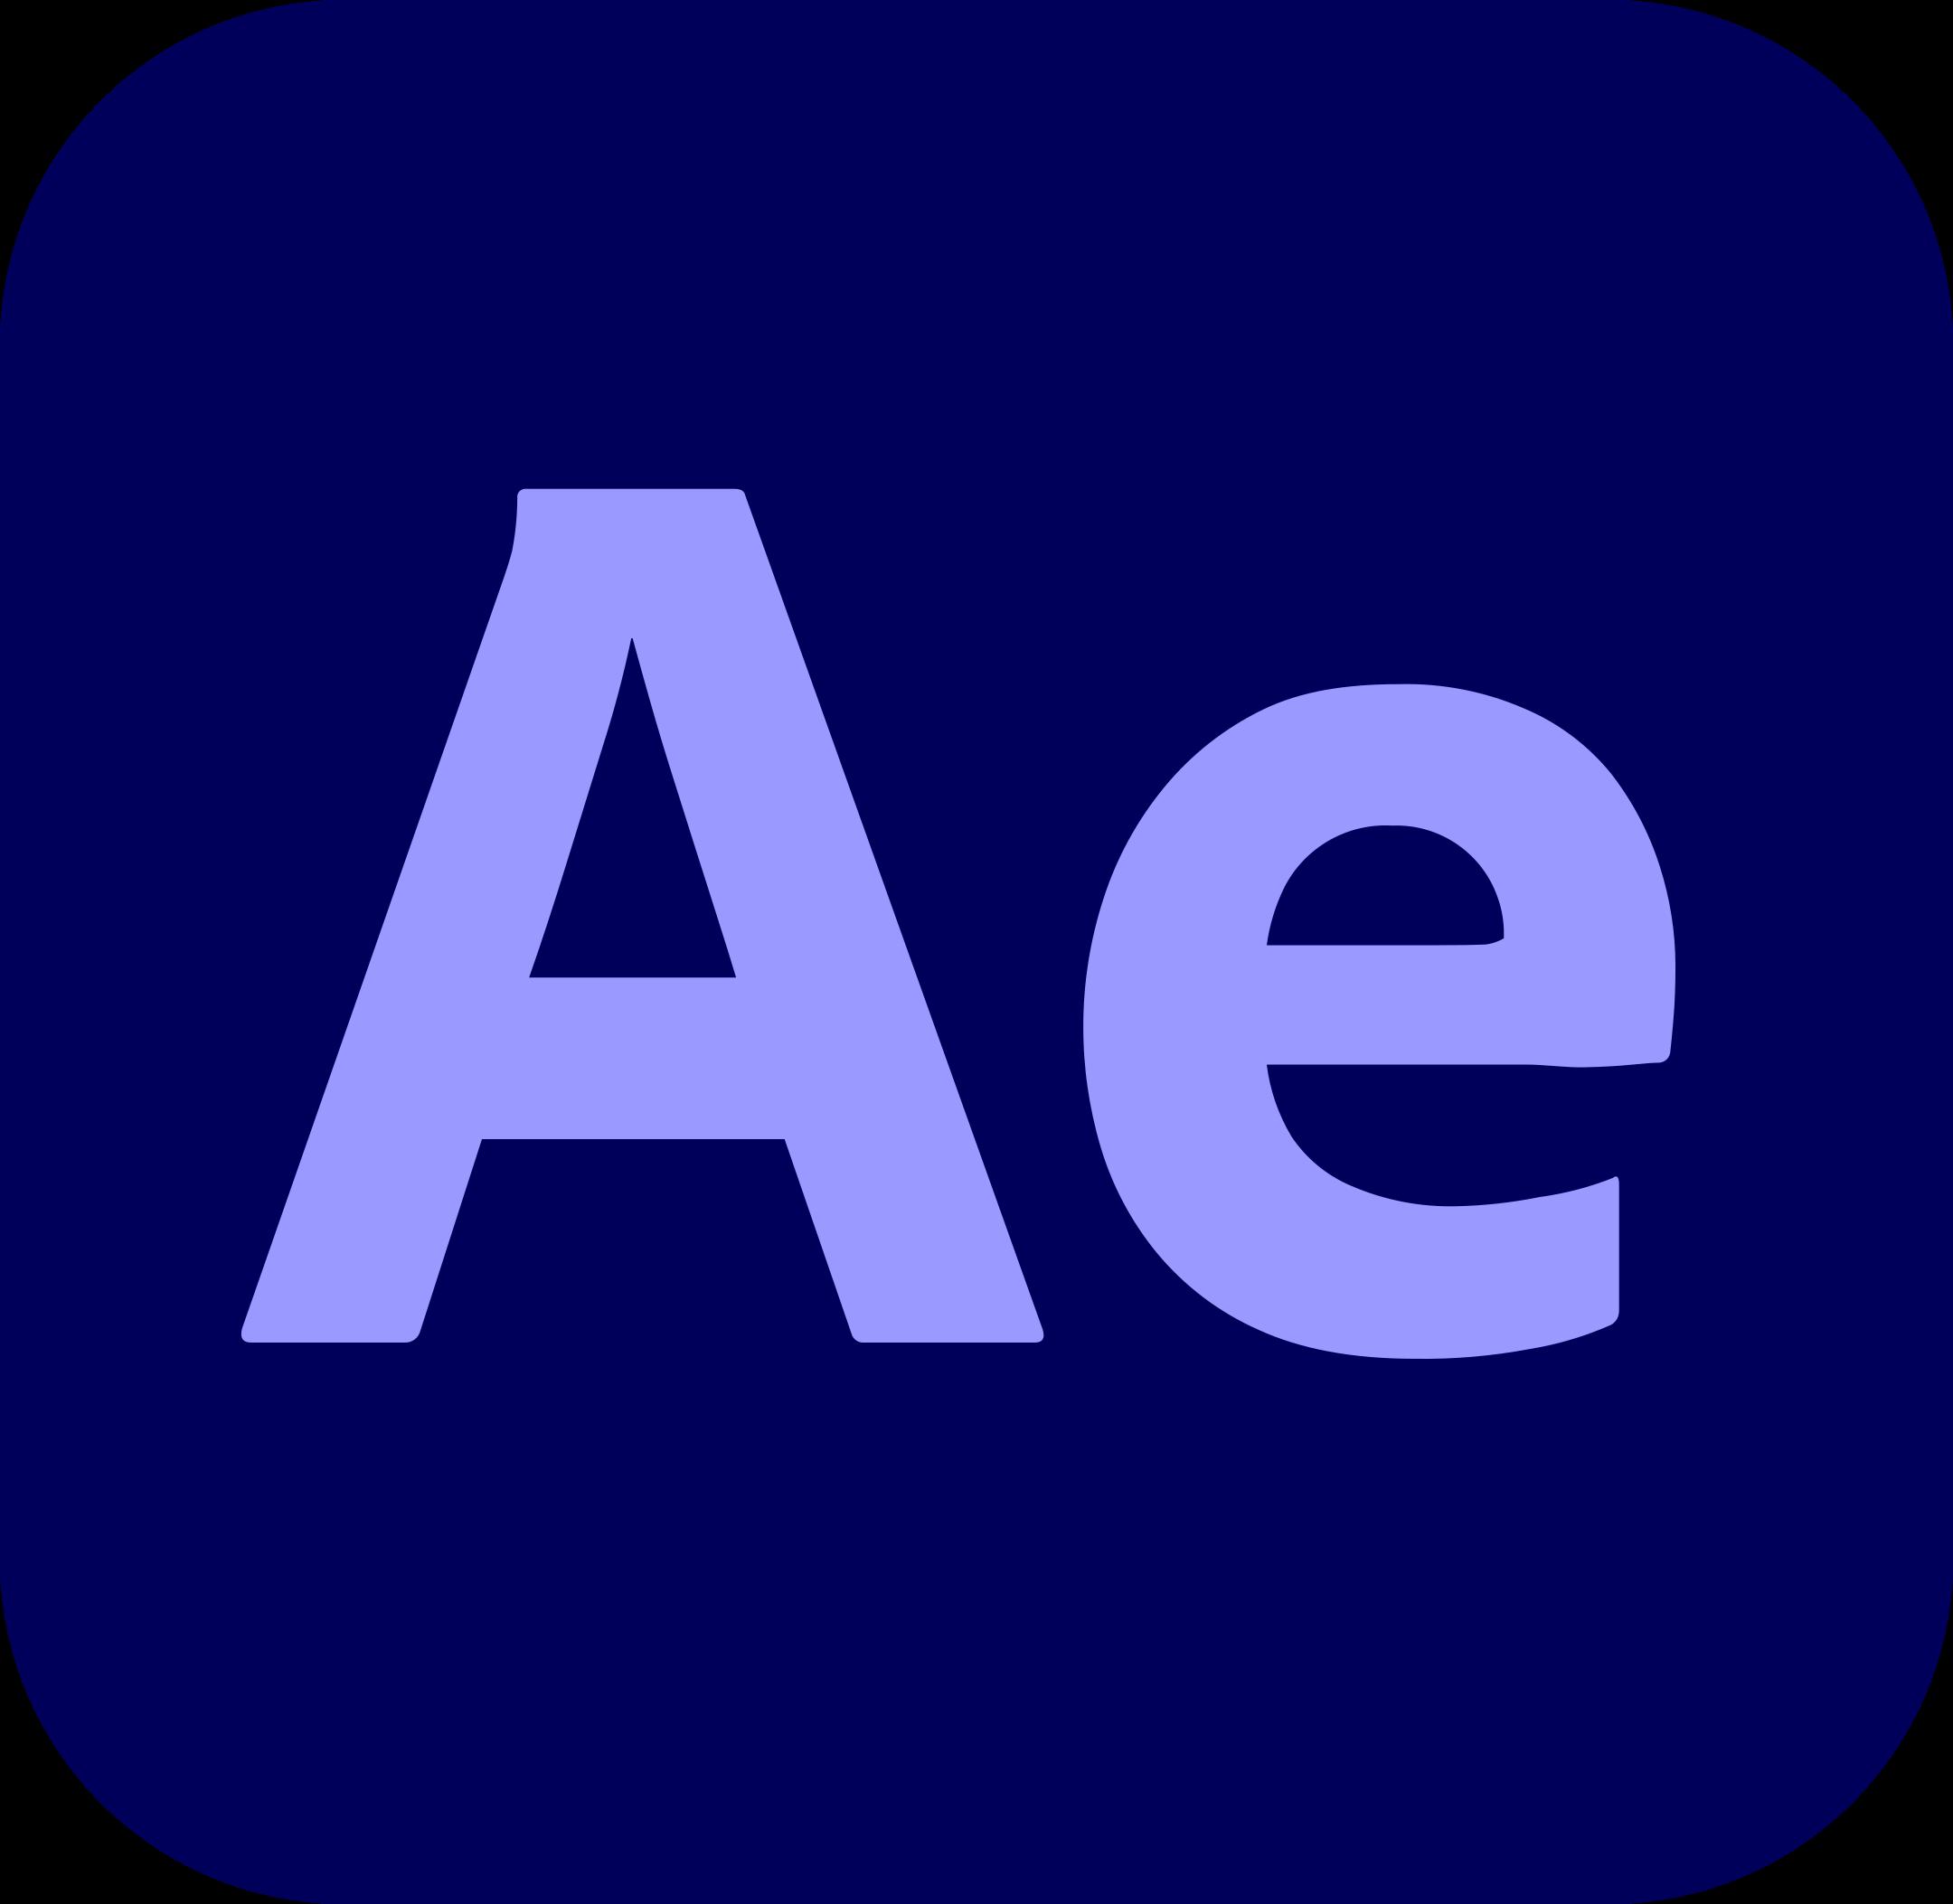 adobe after effects logo 1 1 - Adobe After Effects Logo